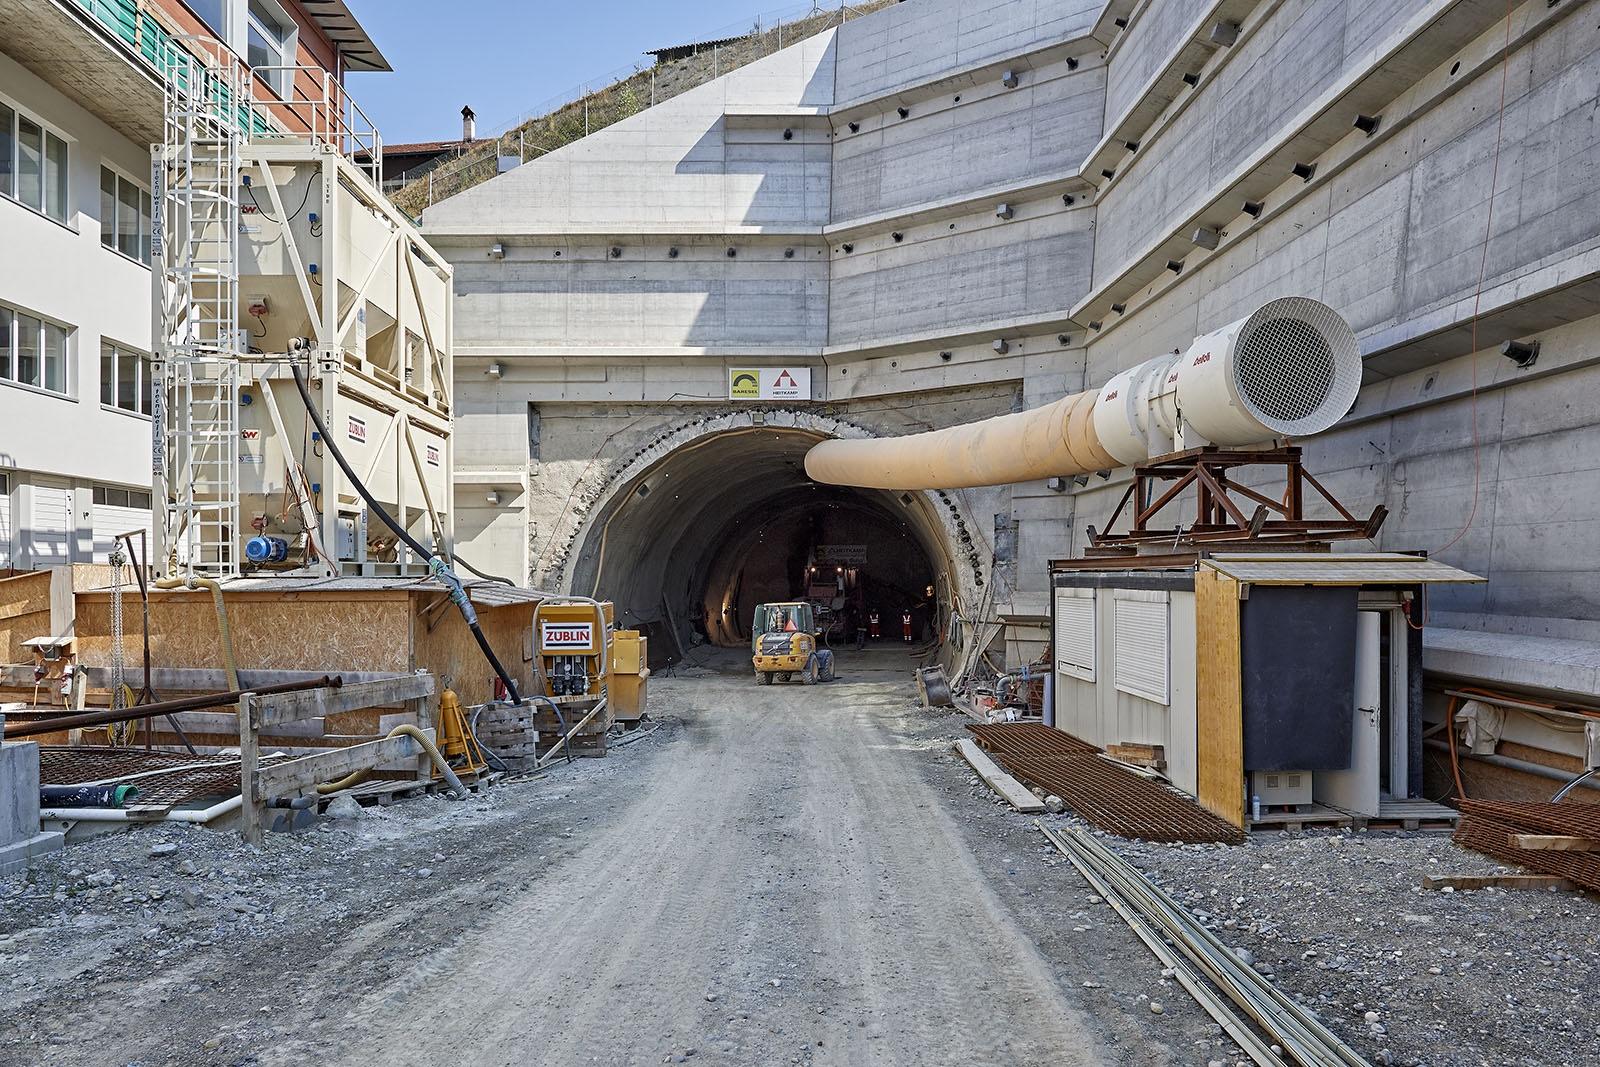 Tunnel_Burg_0614.jpg